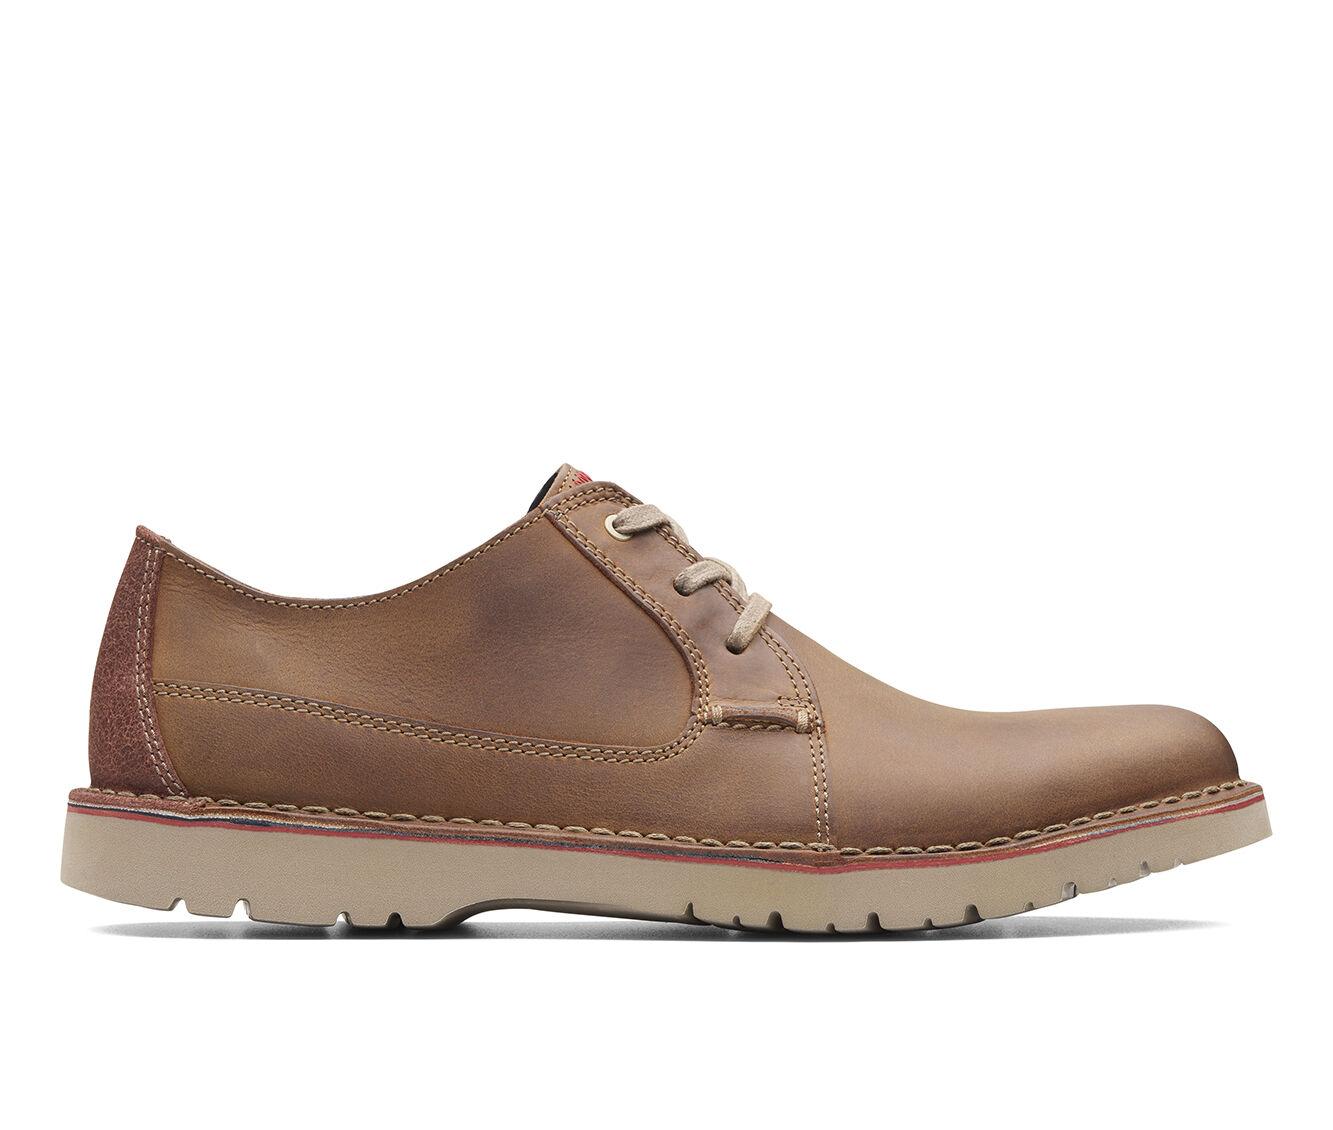 Men's Clarks Vargo Plain Dress Shoes Dark Tan